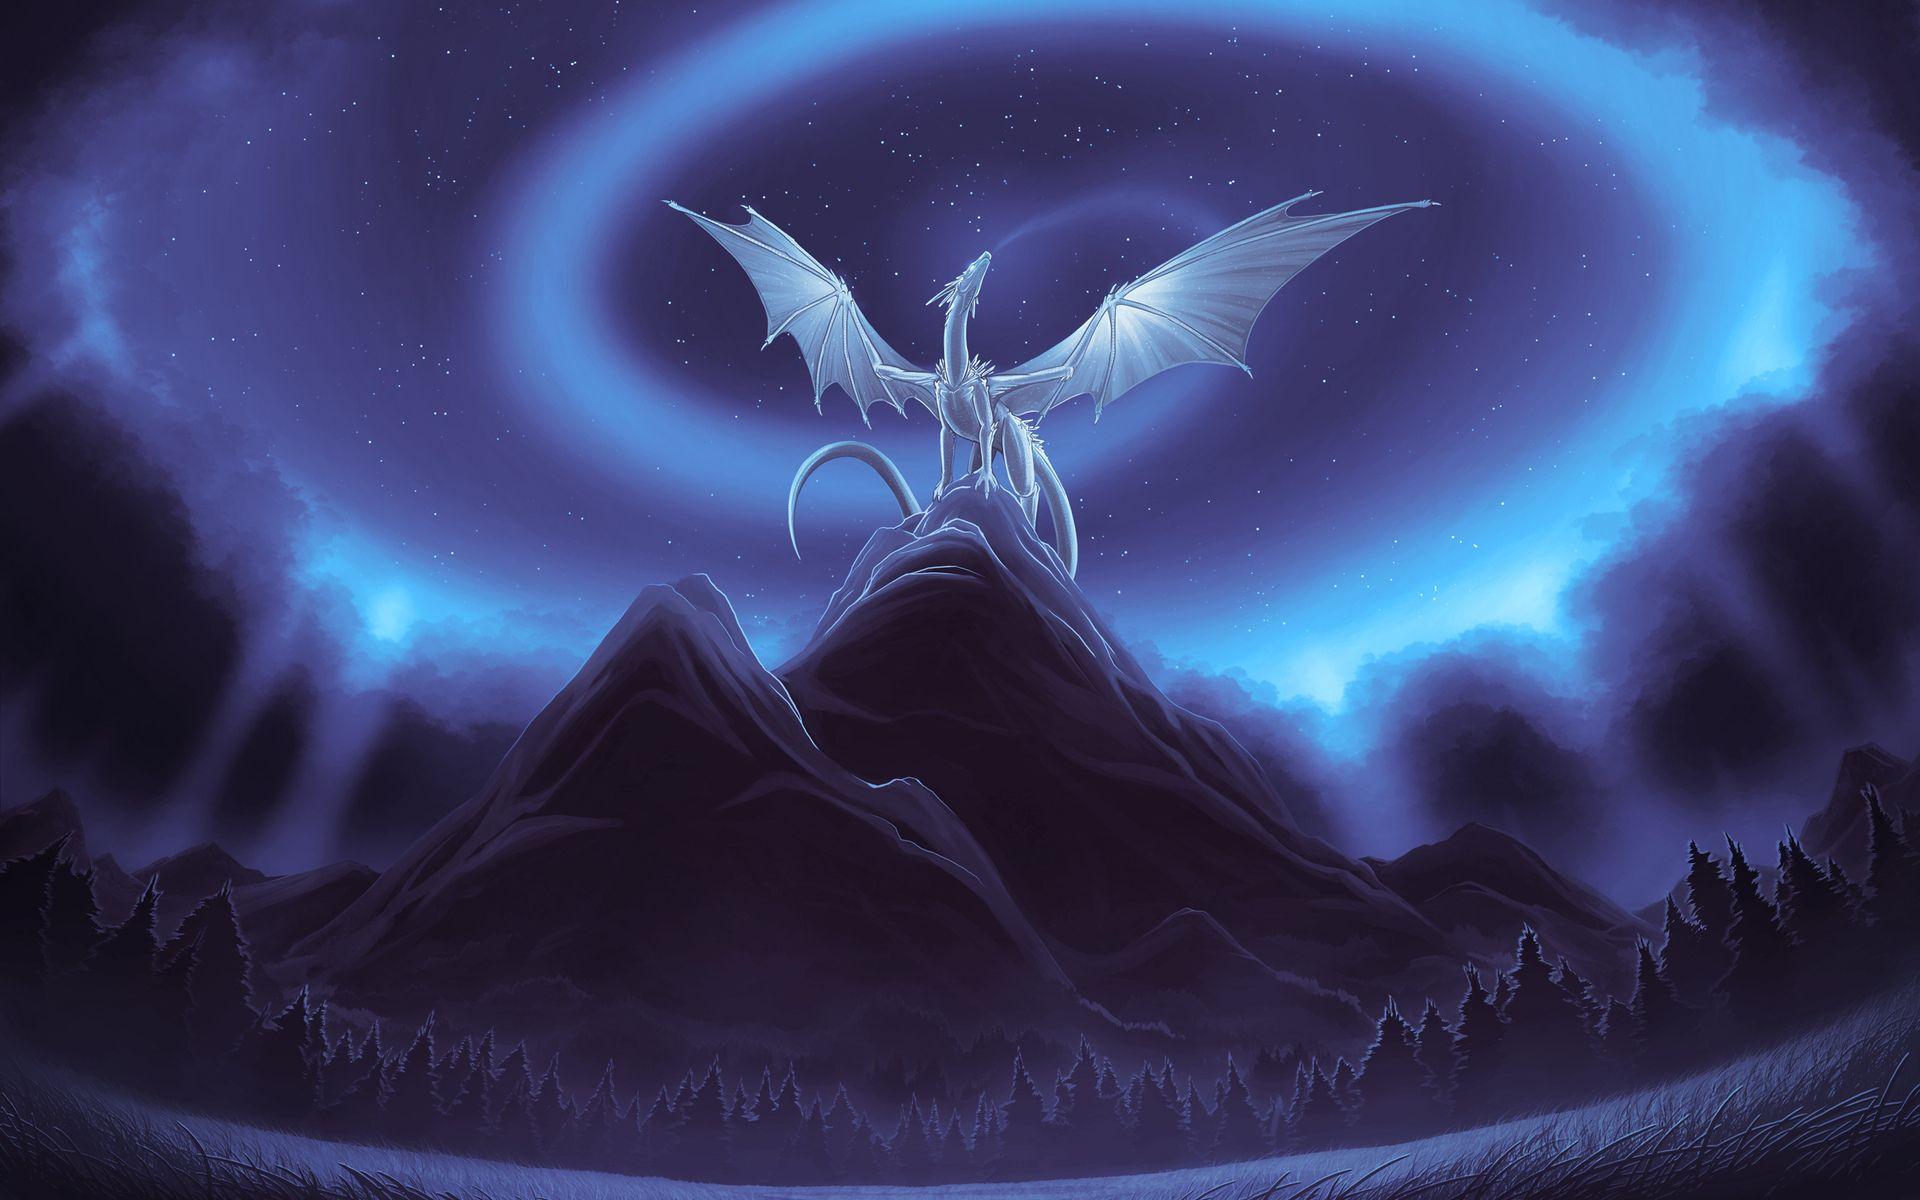 dragons fantasy wallpaper 1920x1200 - photo #10